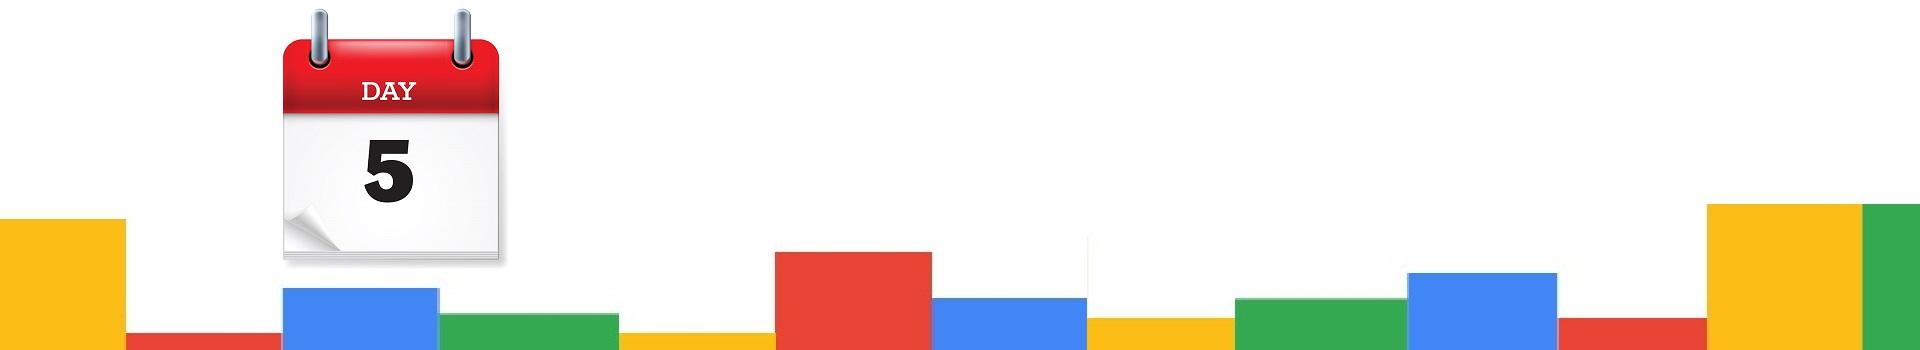 Google Day 5